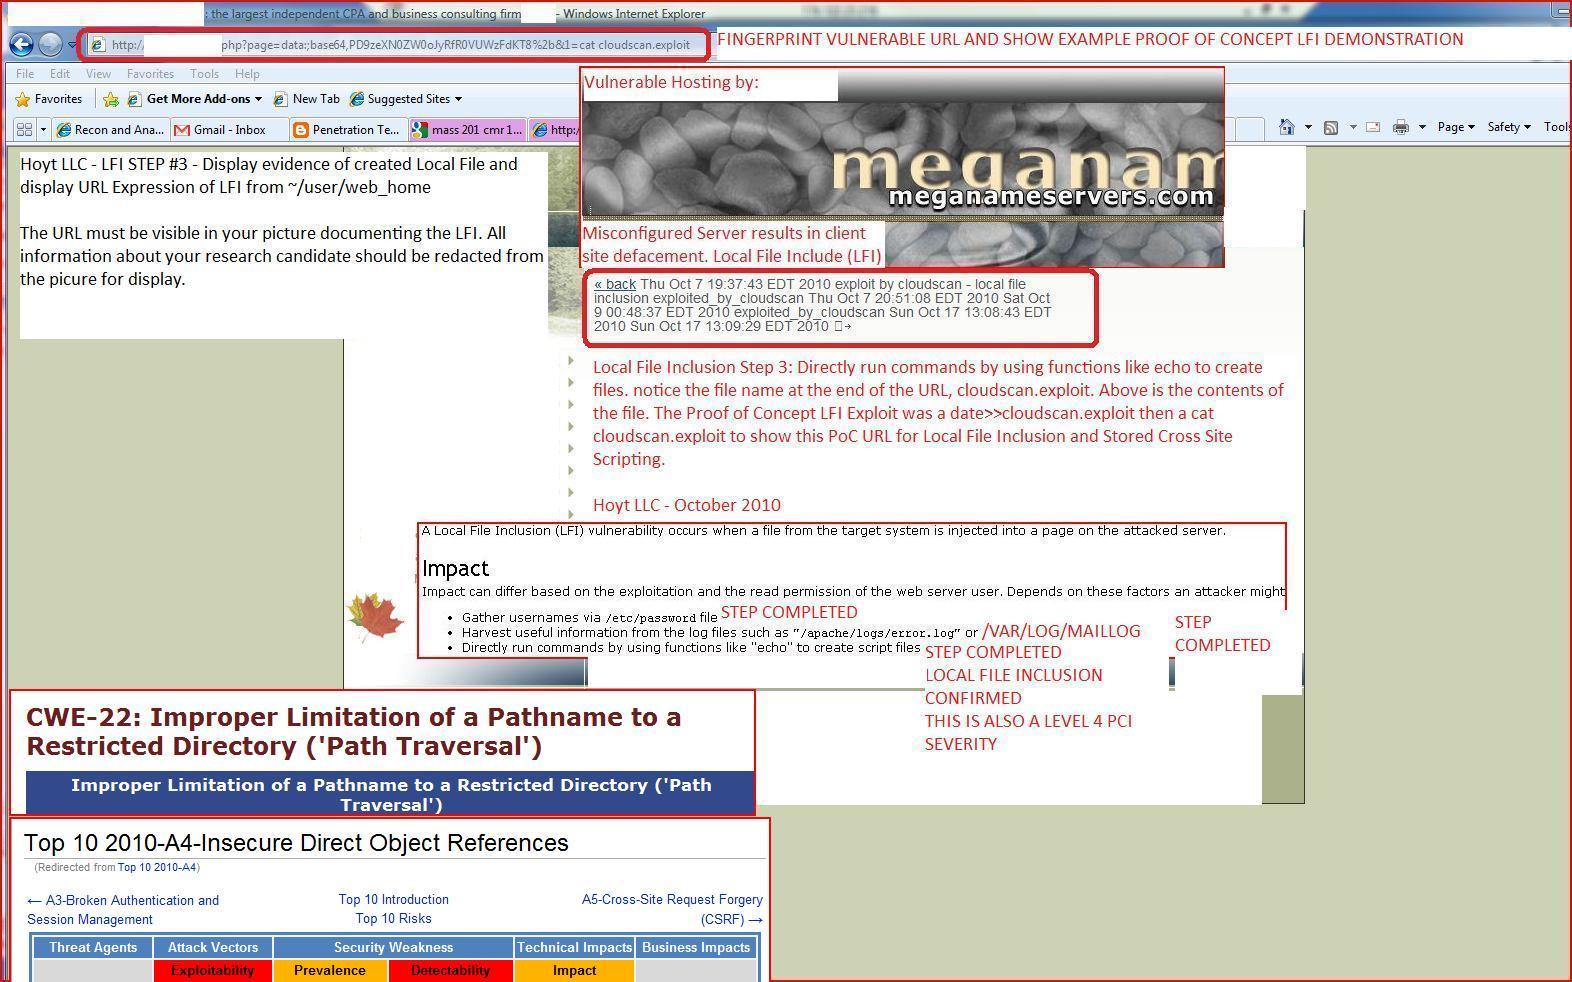 XSS Cx Blog: Local File Inclusion, LFI, Exploit, PoC, Proof of